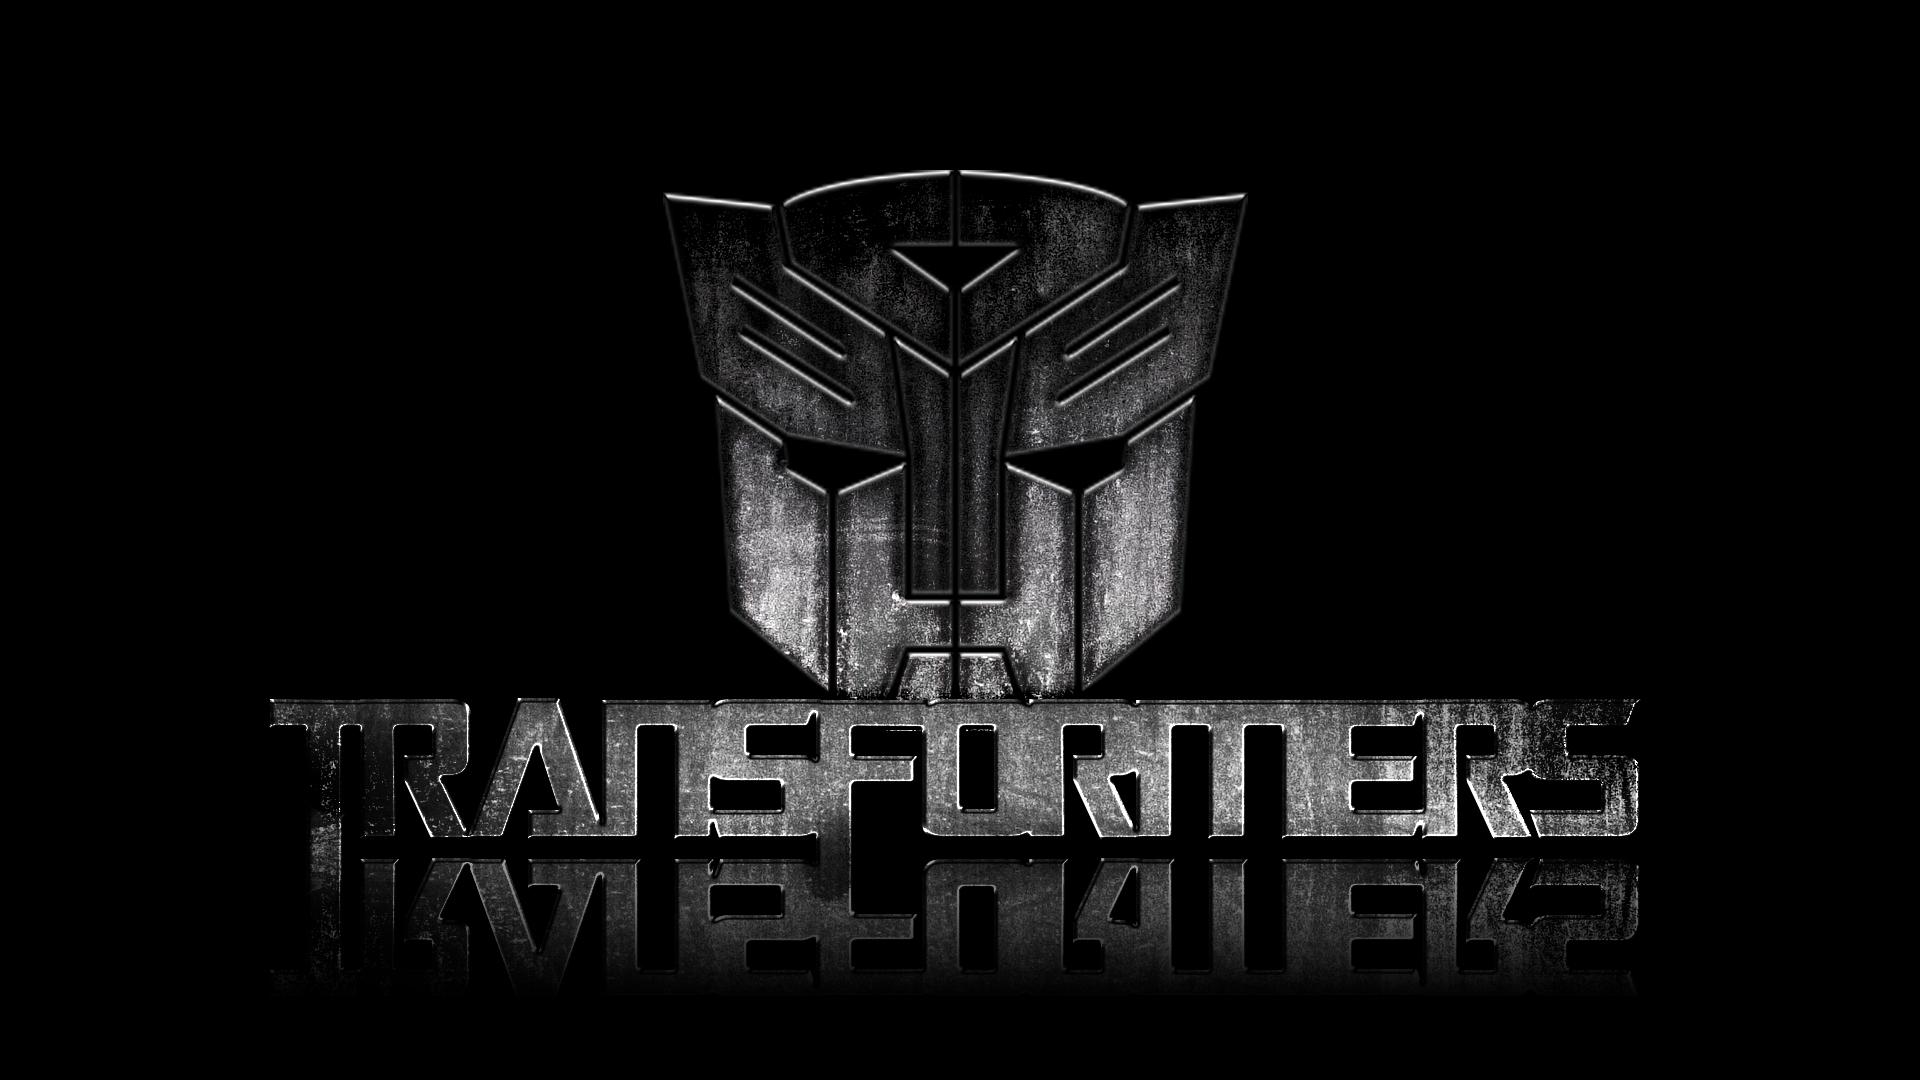 Transformers Wallpaper By Tramauhh On DeviantArt